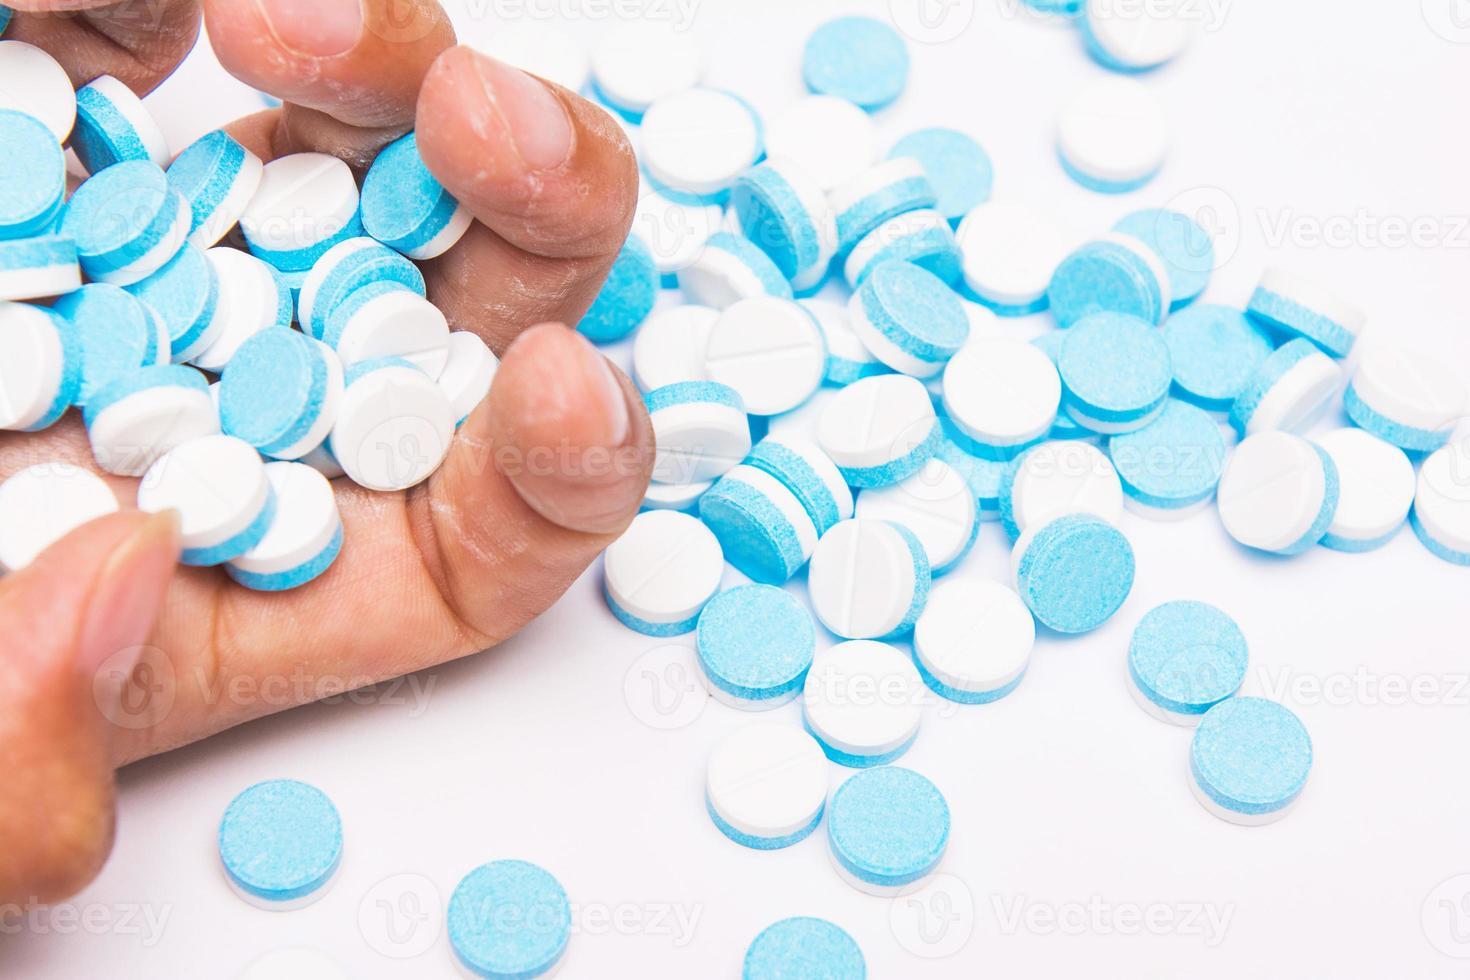 pillole compresse bianche e blu a portata di mano foto